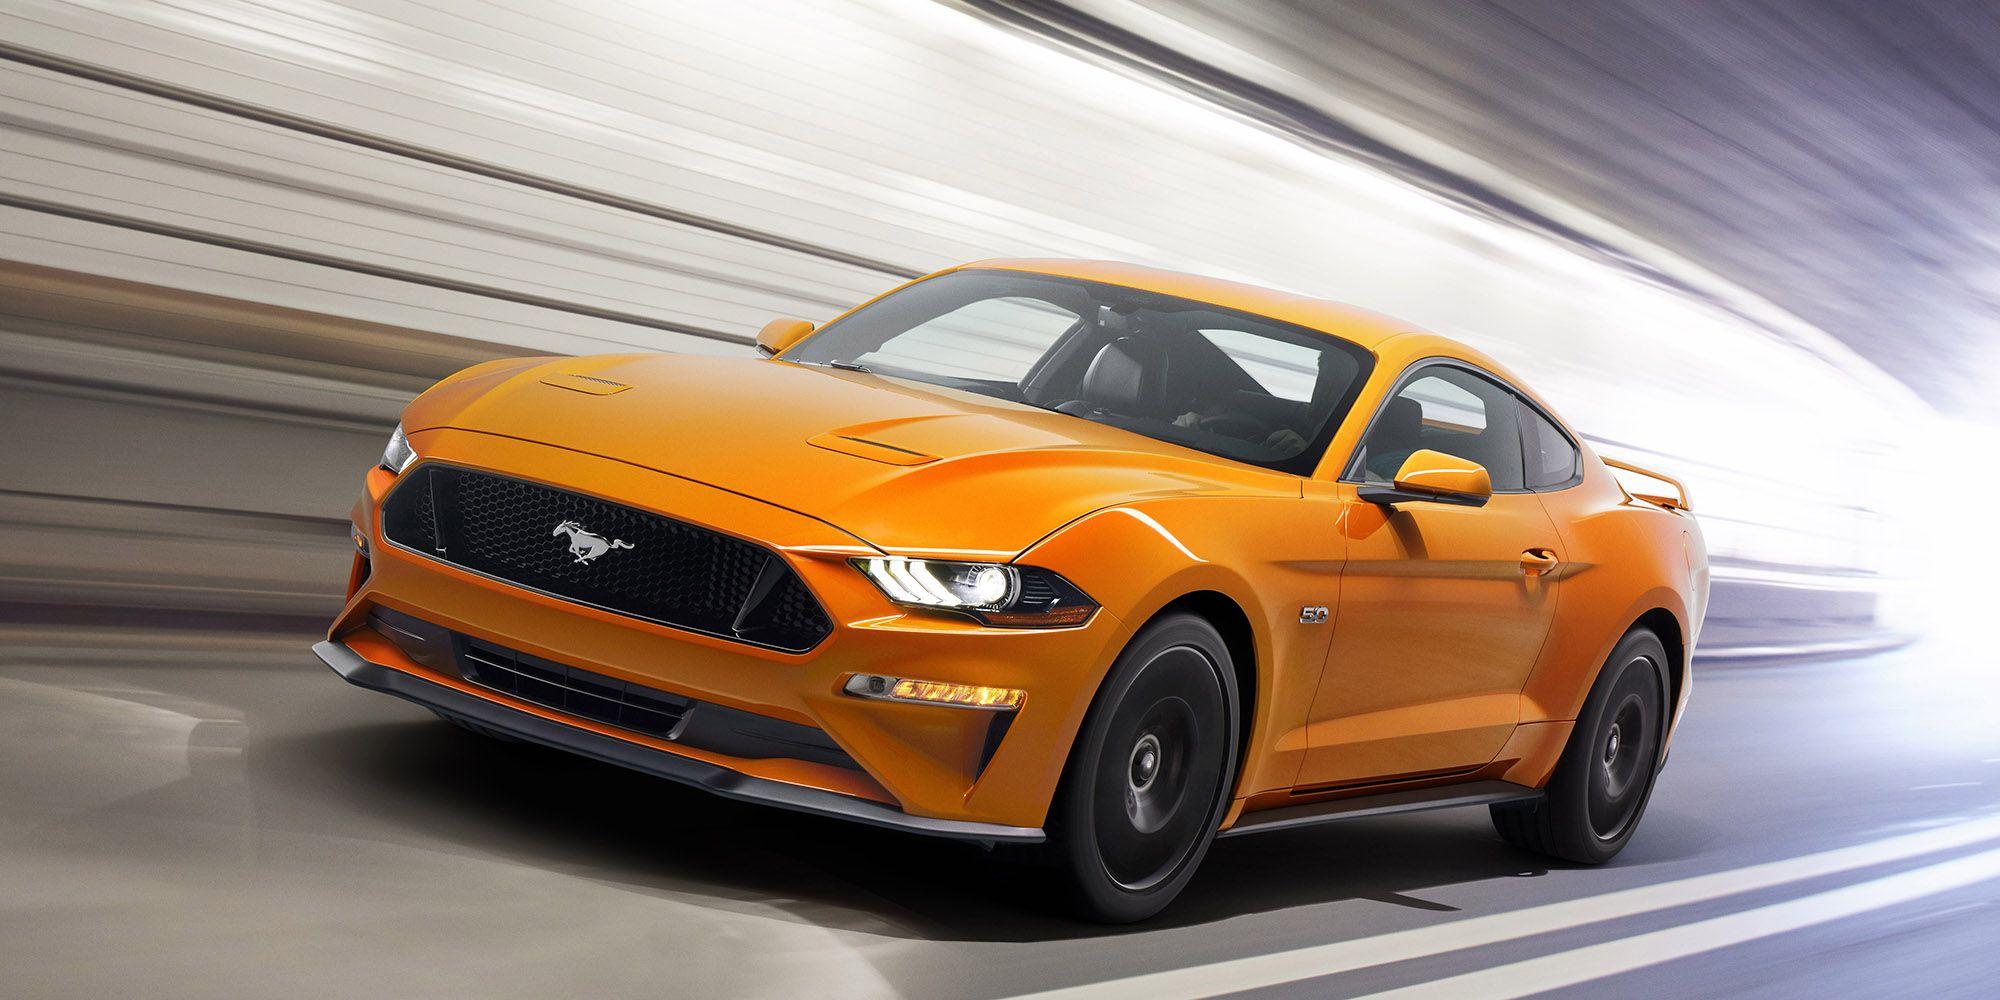 2018 Ford Mustang Specs Mustang Gt Horsepower 0 60